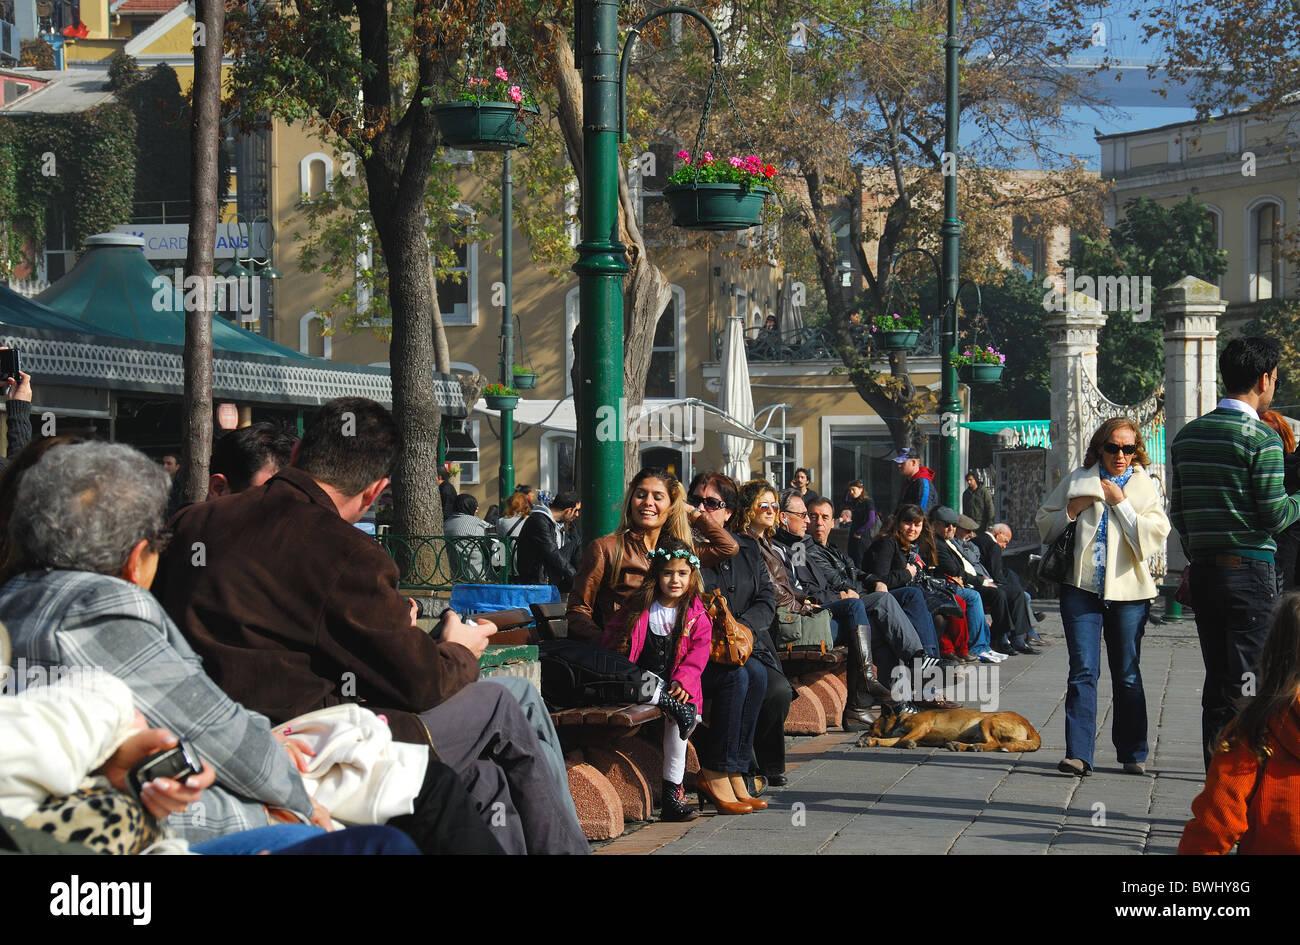 ISTANBUL, TURKEY. A colourful street scene in the Bosphorus suburb of Ortakoy. 2010. Stock Photo